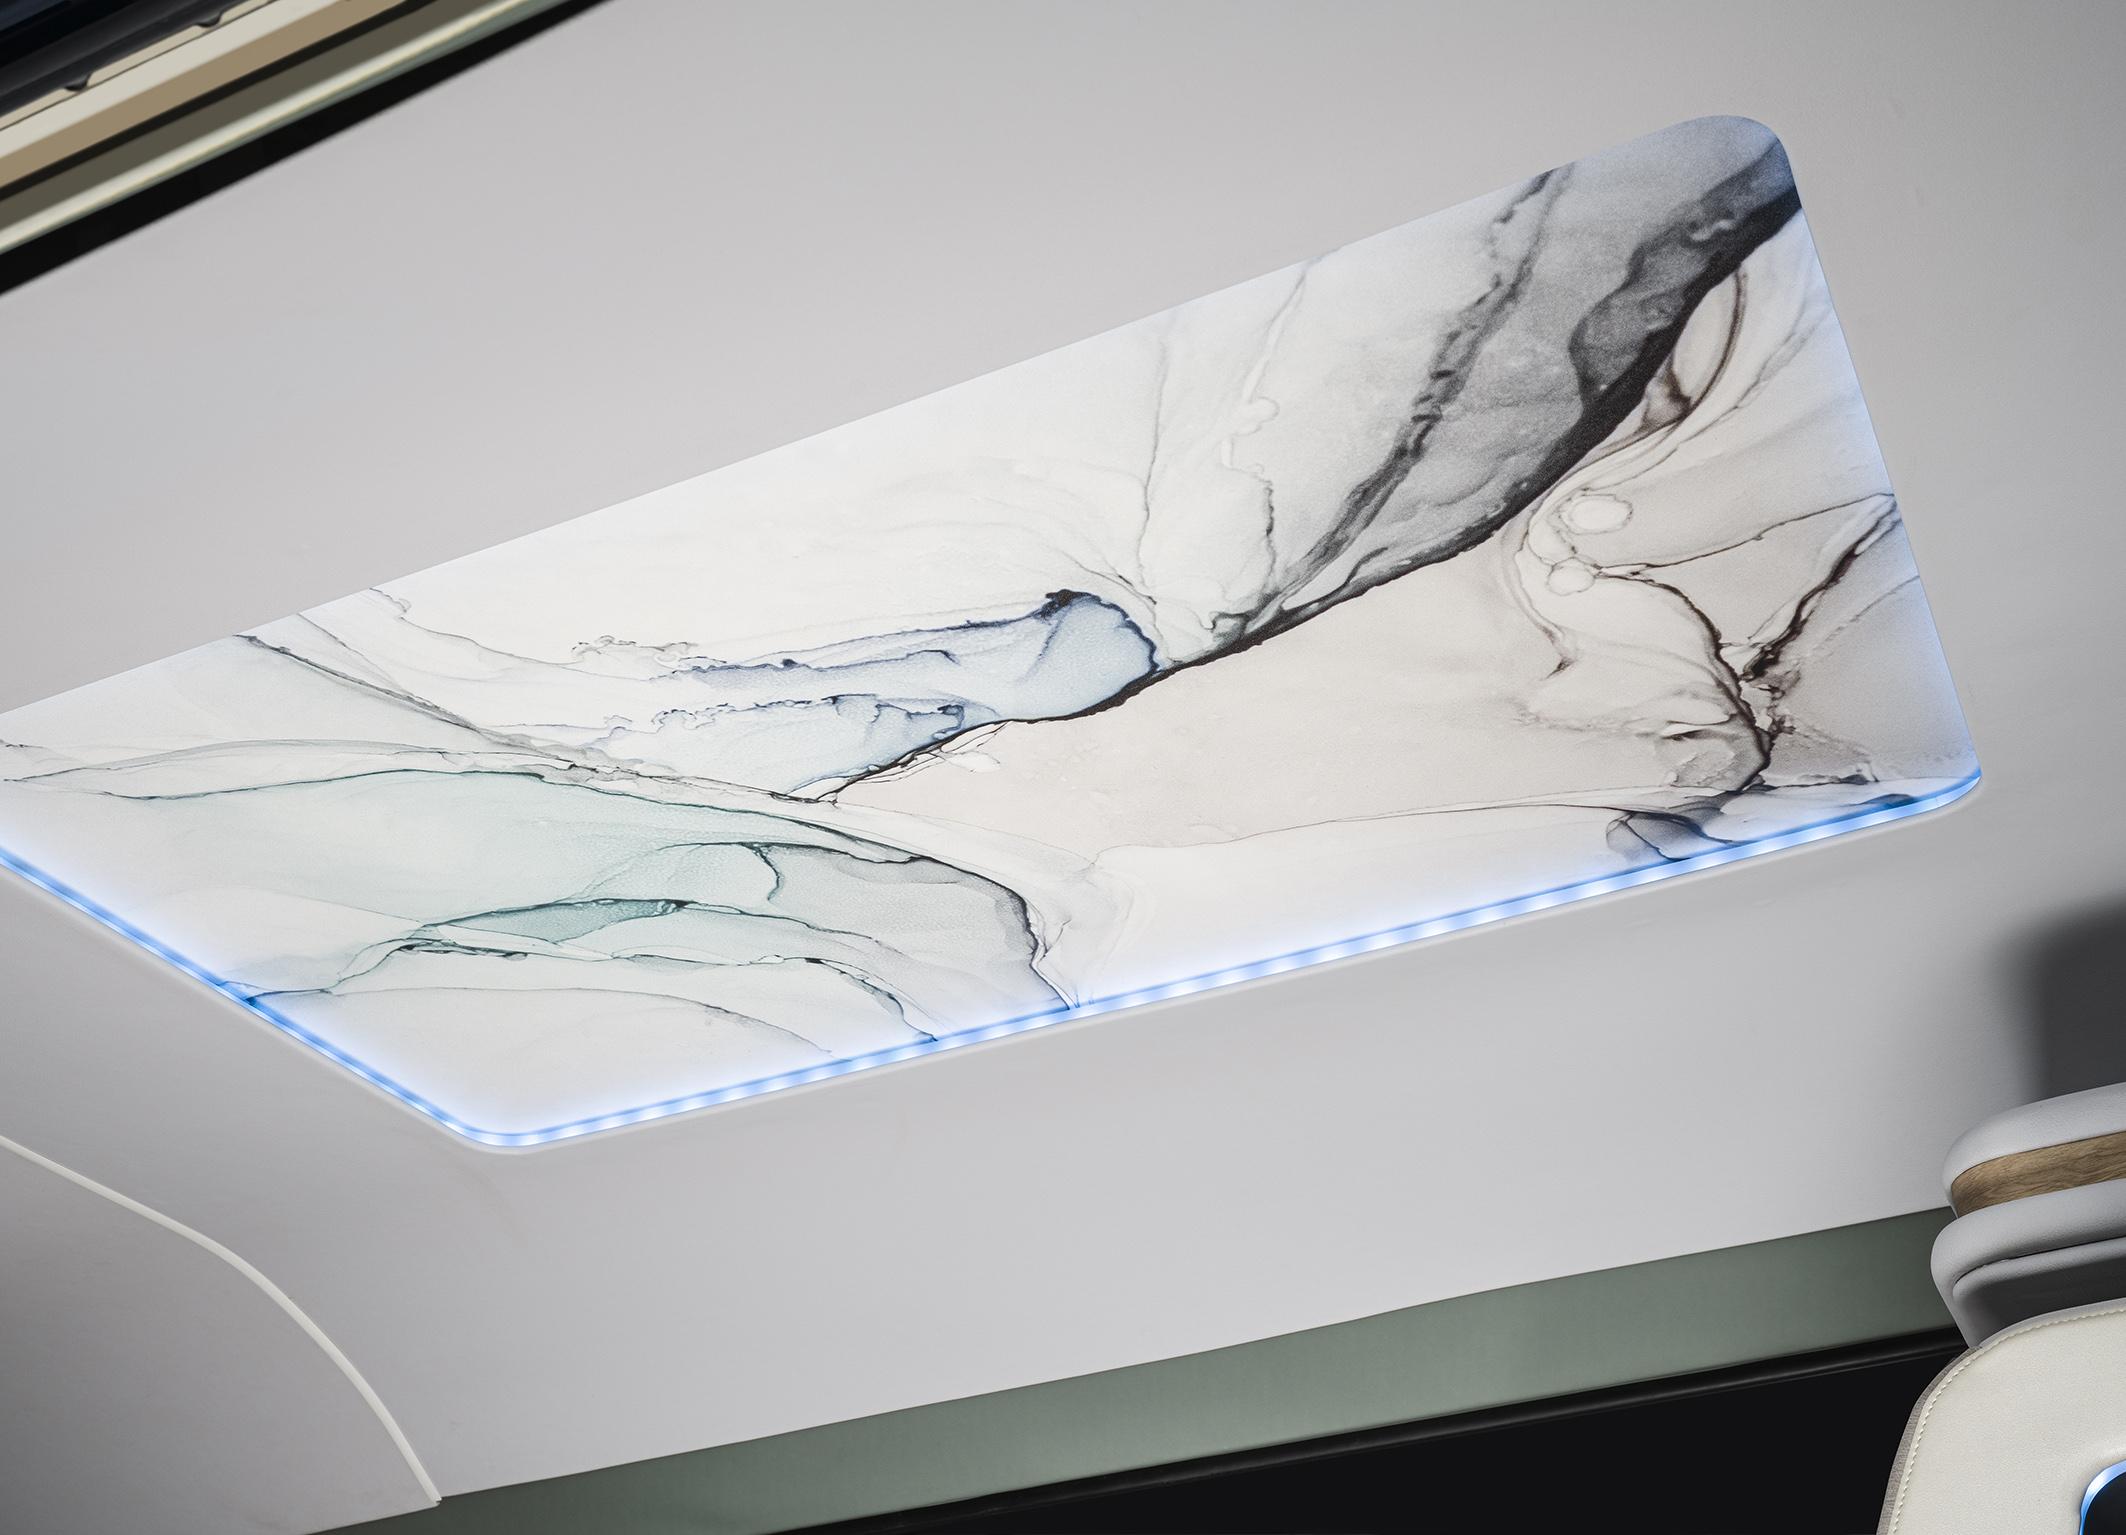 Continental ambience interior lighting